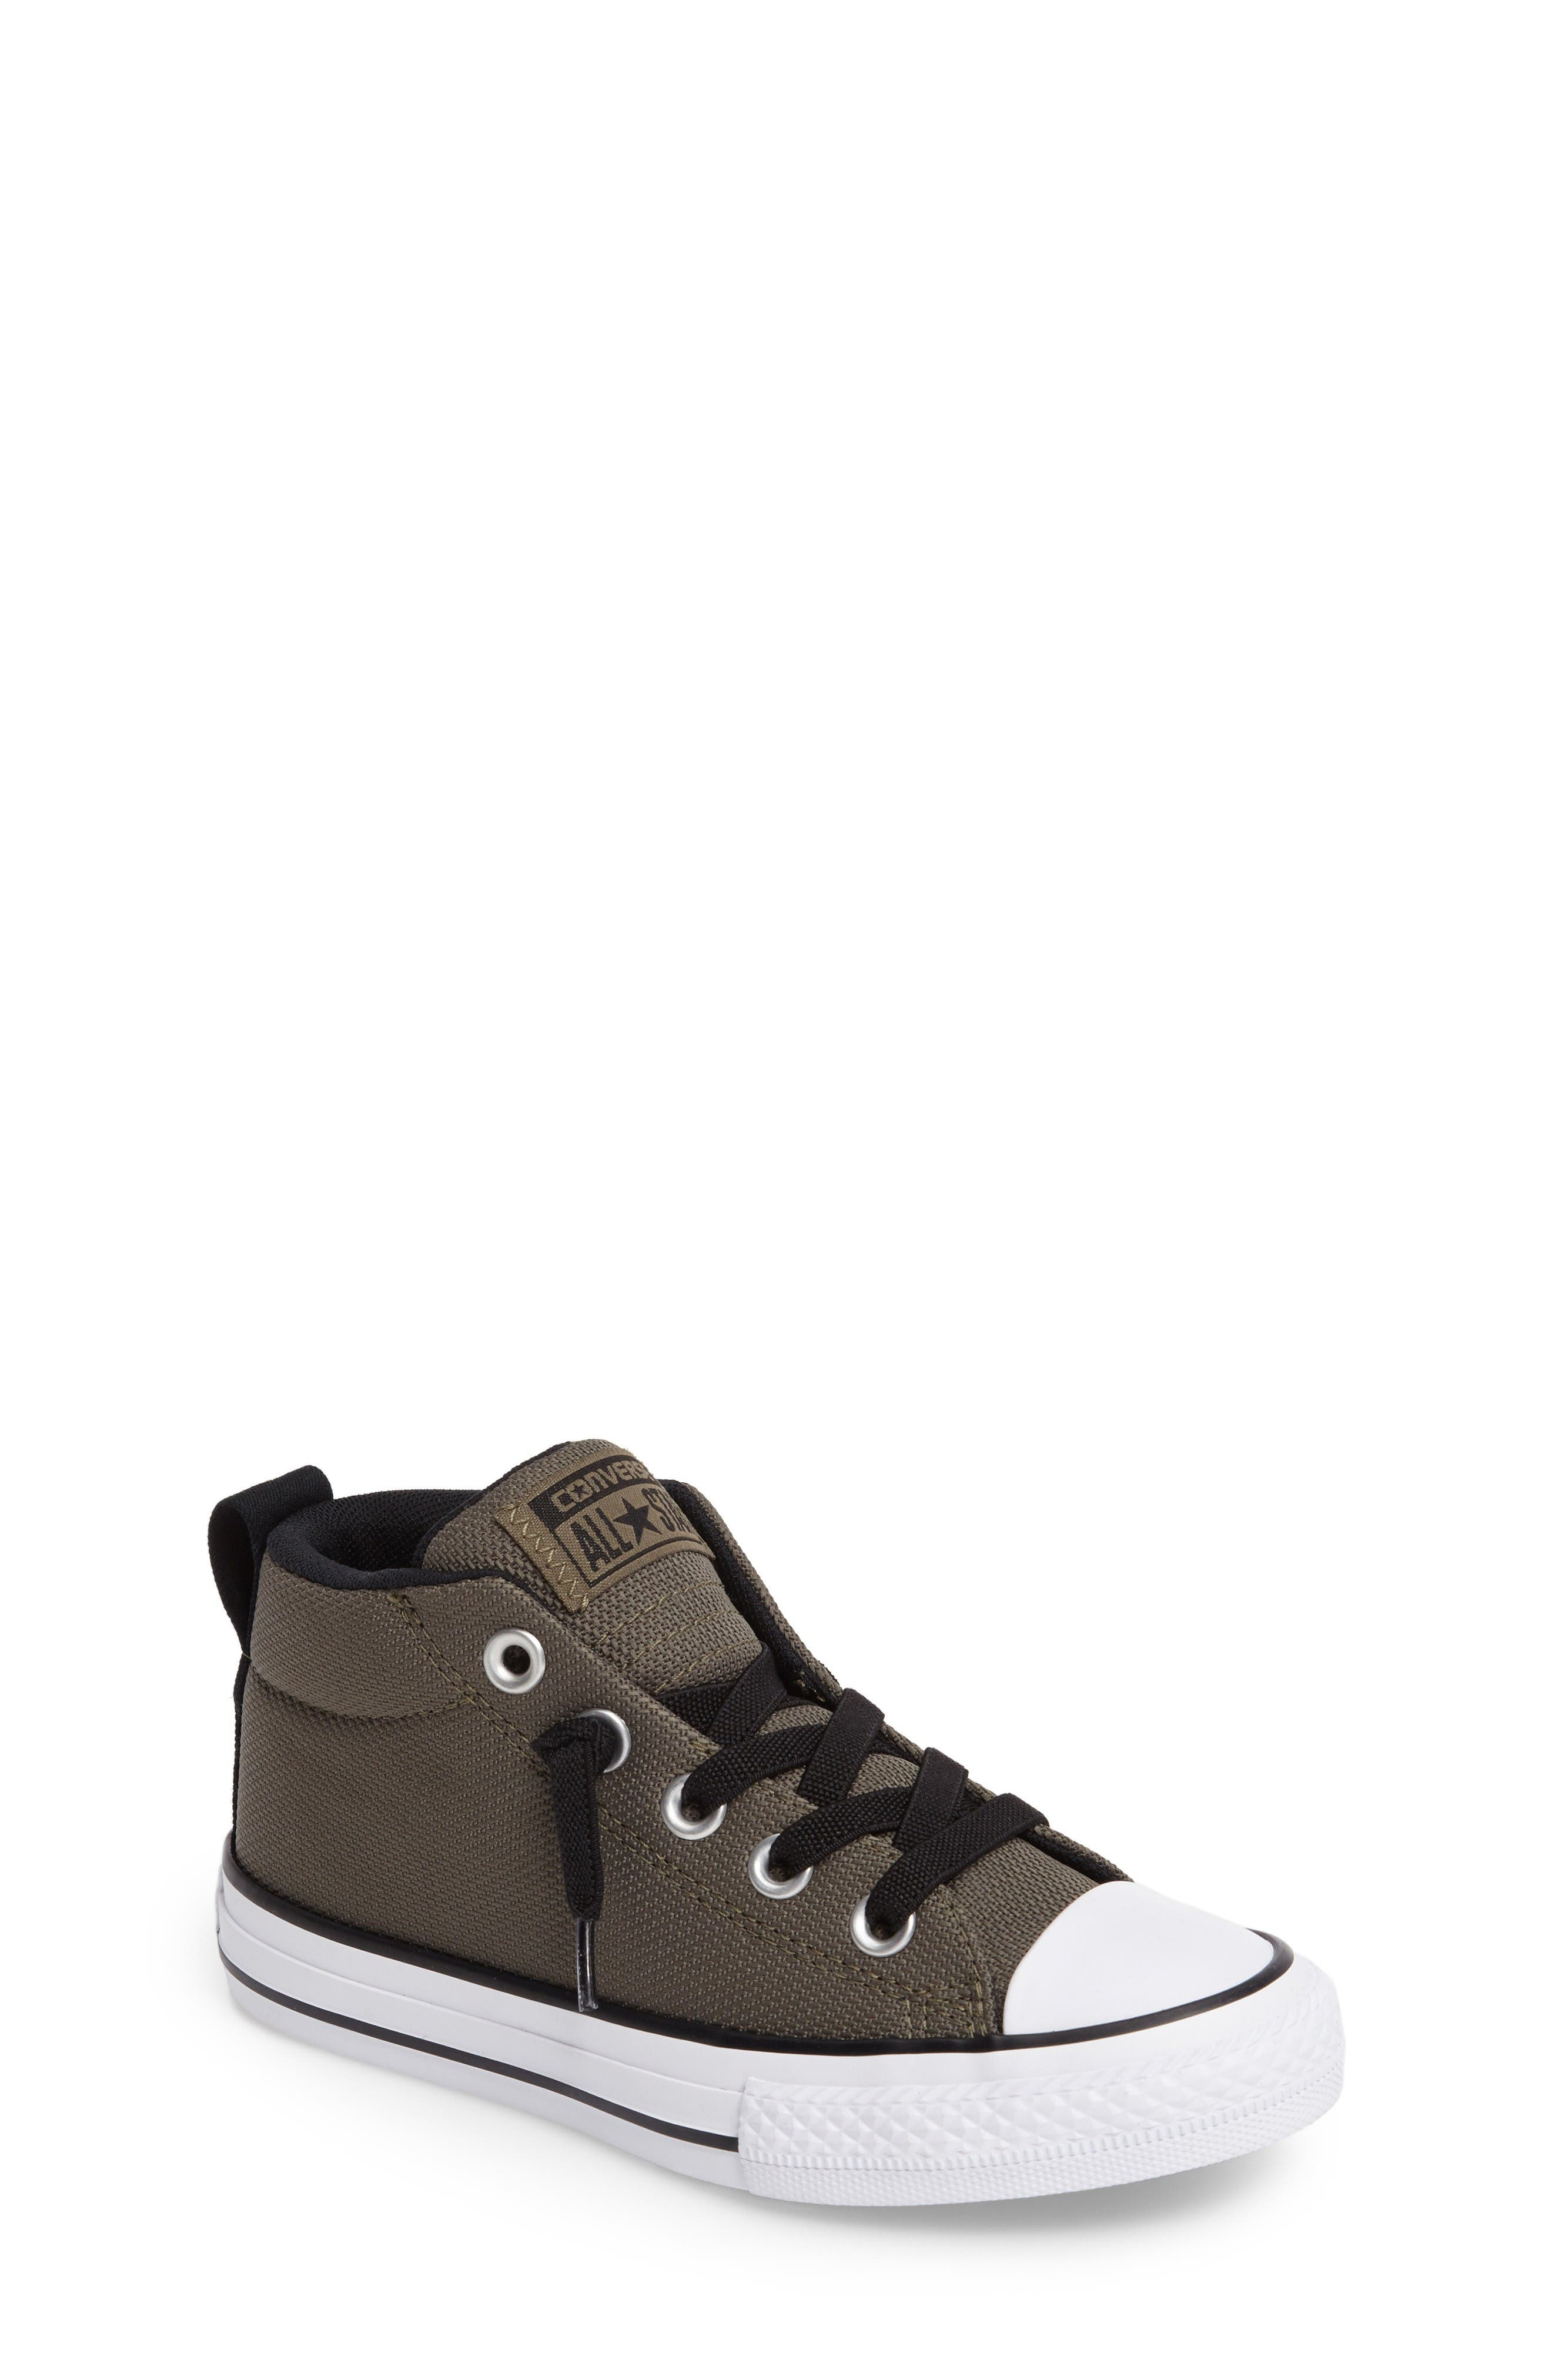 Converse Chuck Taylor® All Star® Basket Weave Street Mid Sneaker (Toddler, Little Kid & Big Kid)